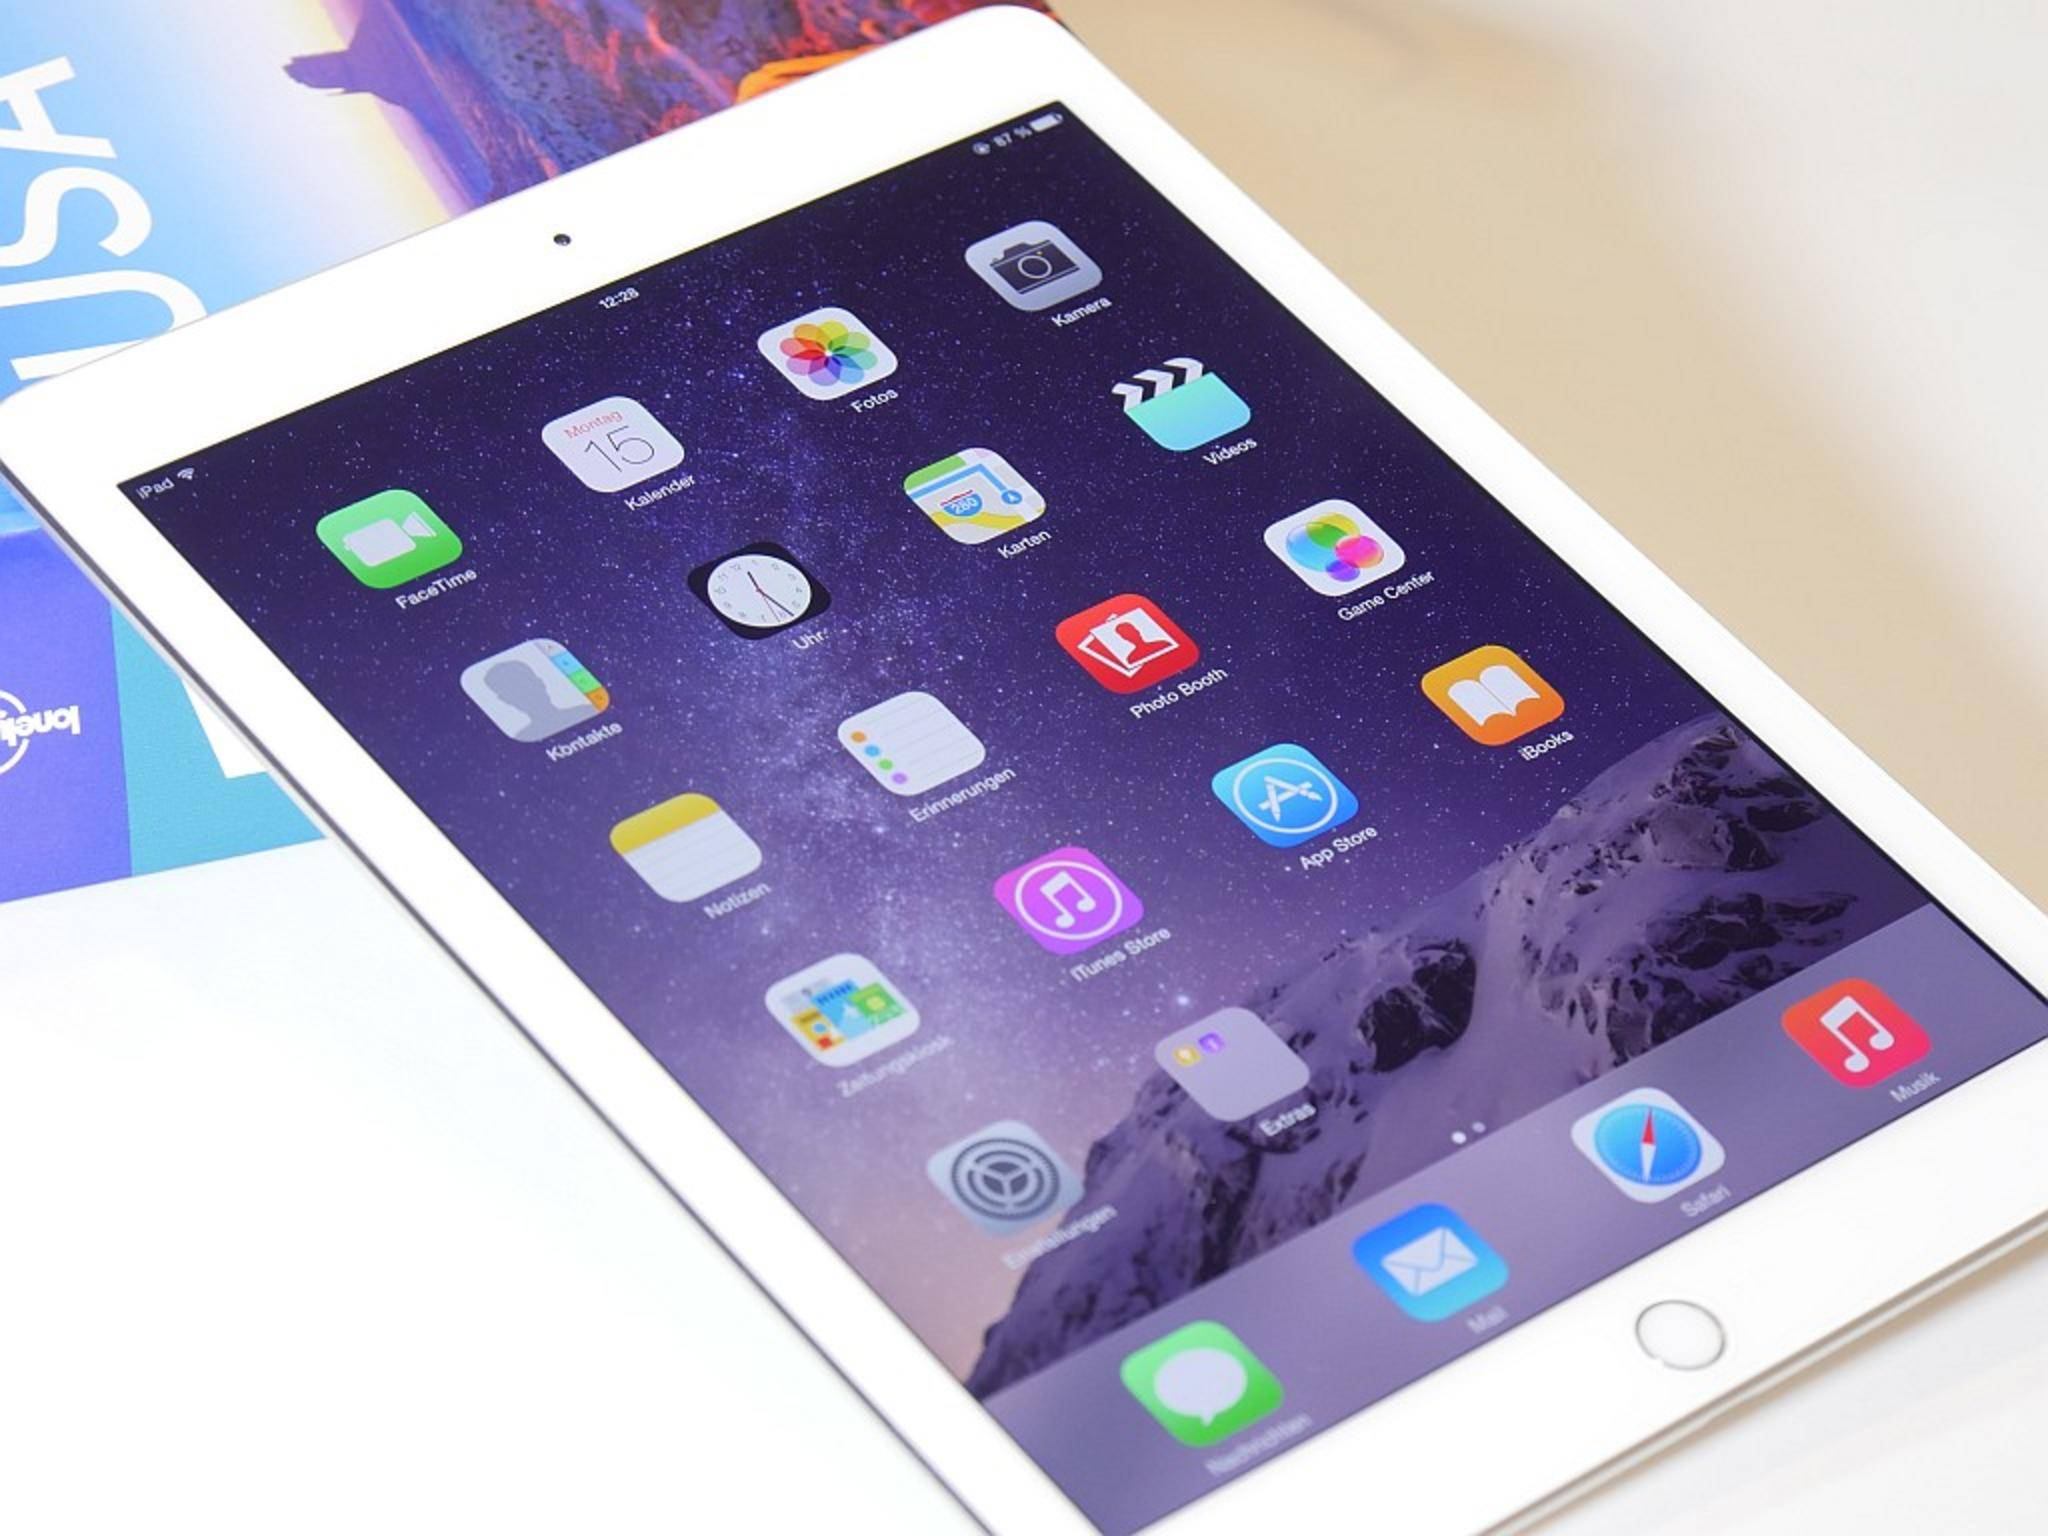 Bald nicht mehr verfügbar? Das iPad Air 2.